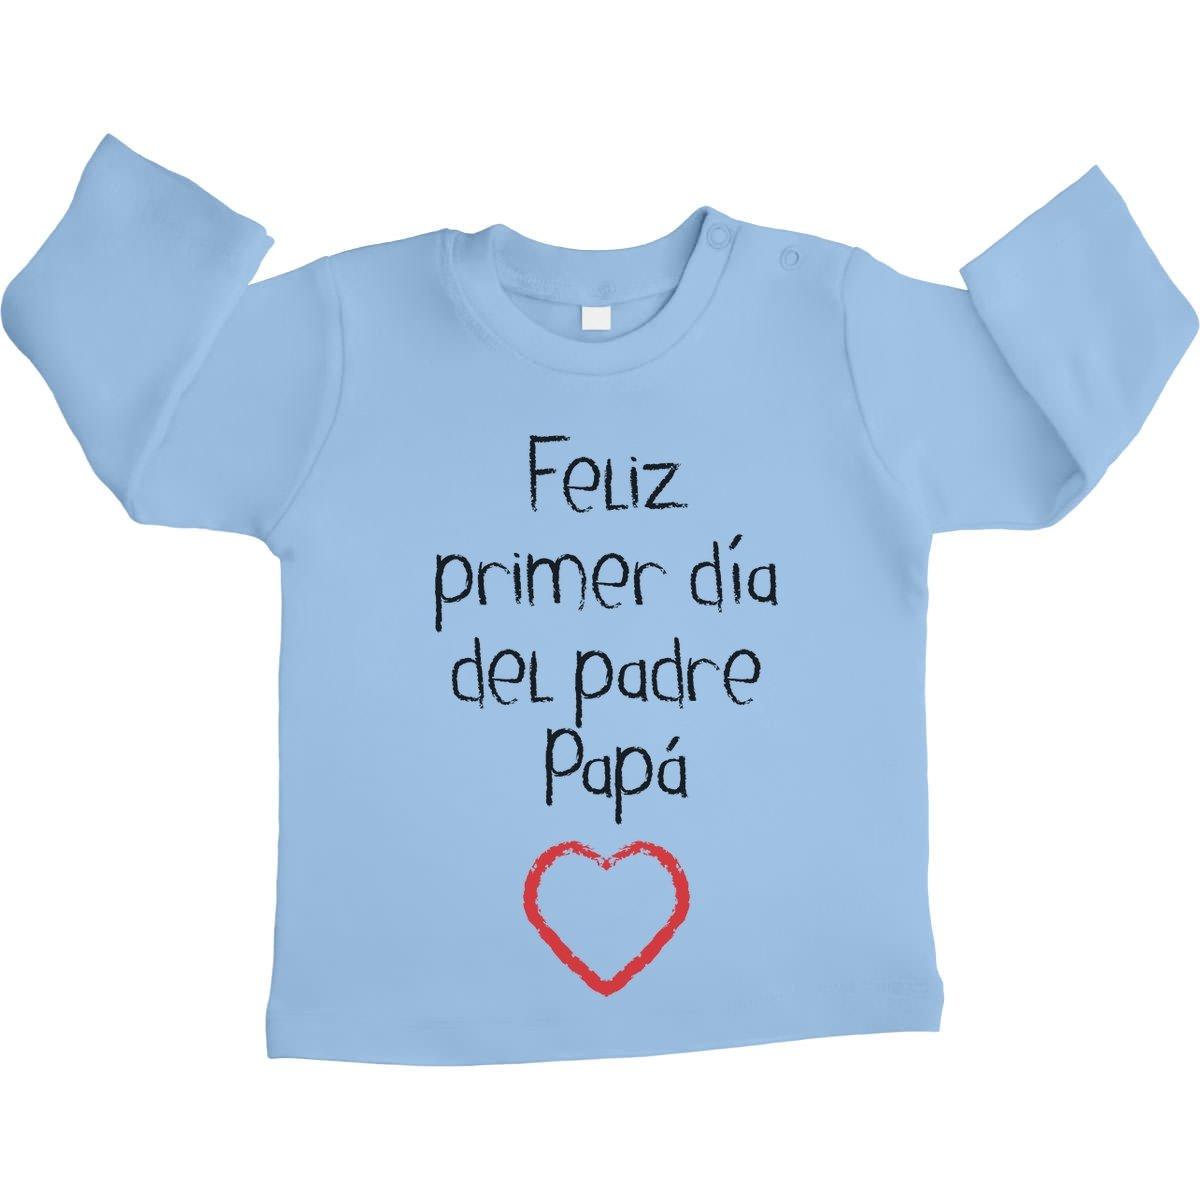 Shirtgeil Regalo - Feliz Primer Día del Padre Papá Camiseta Bebé Unisex Manga Larga